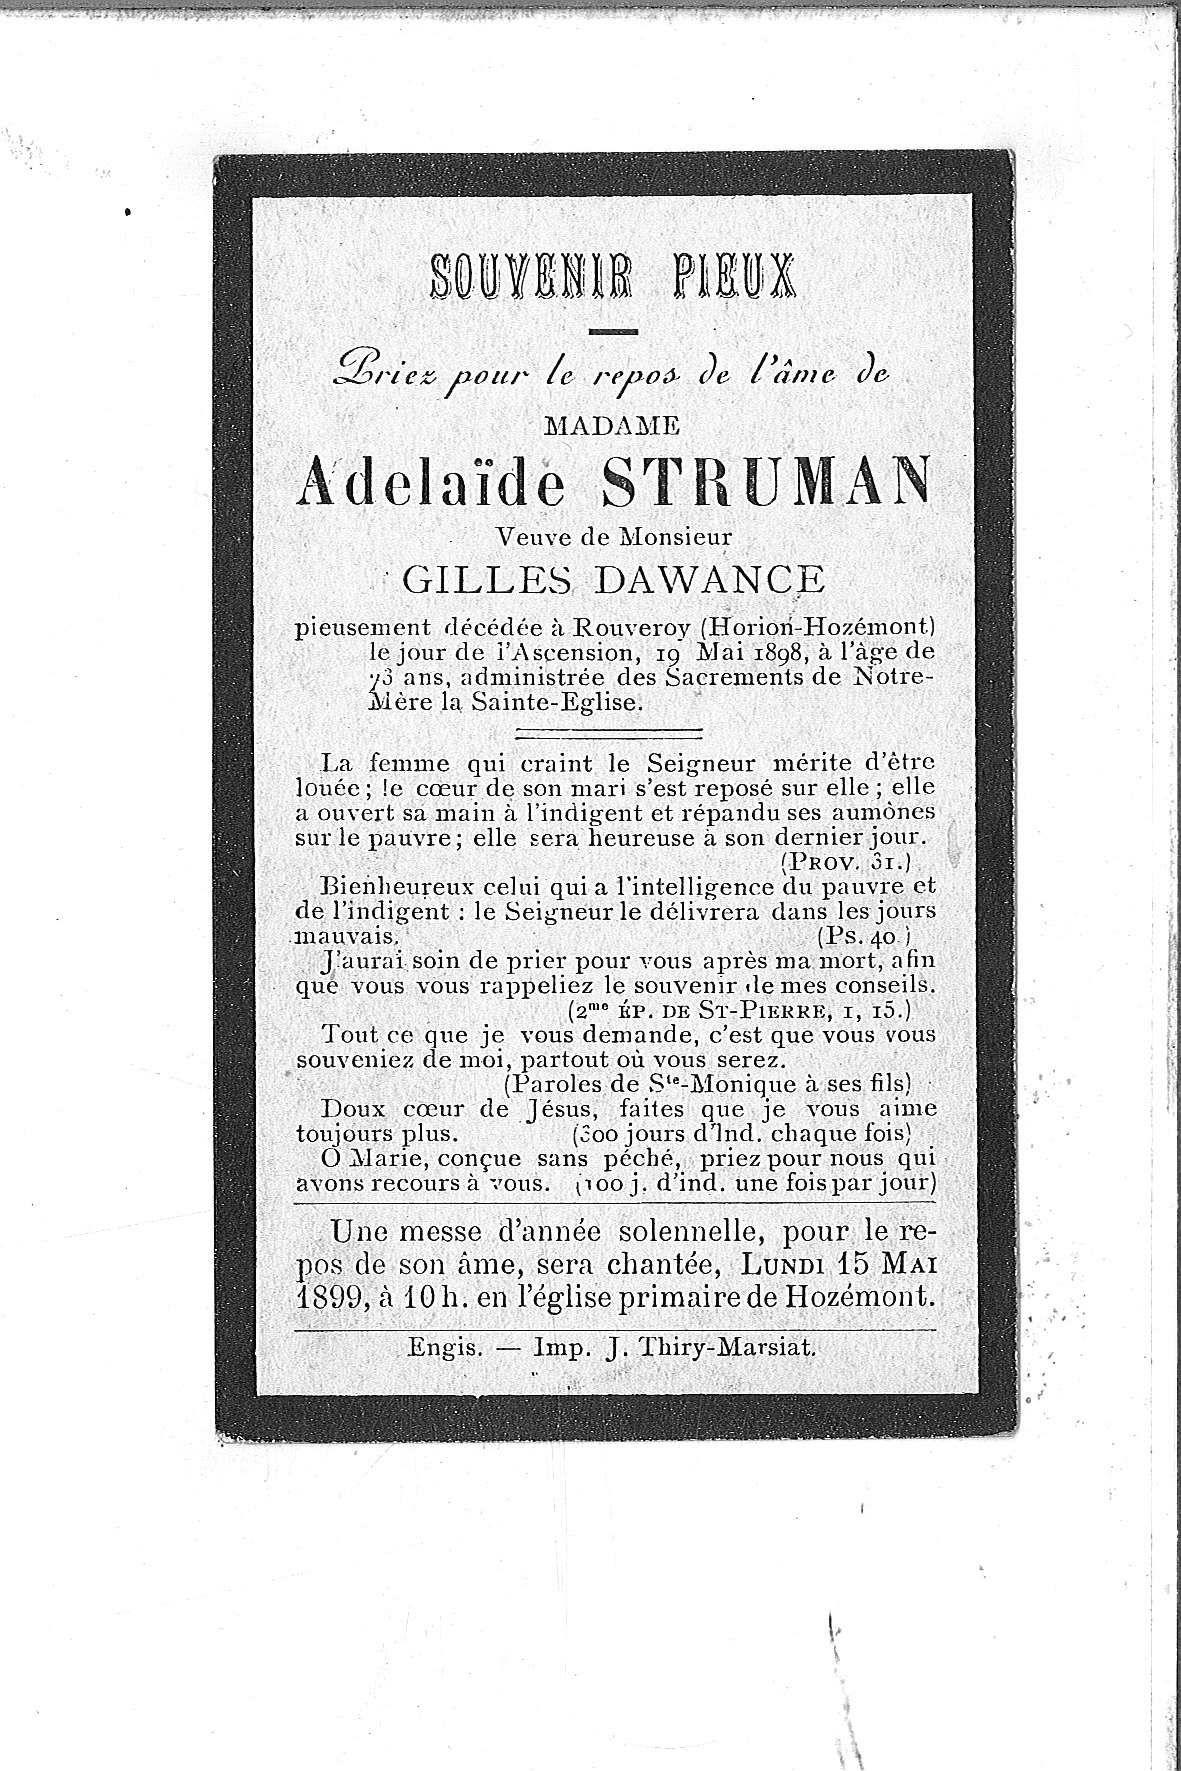 Adelaïde(1898)20140626091125_00023.jpg